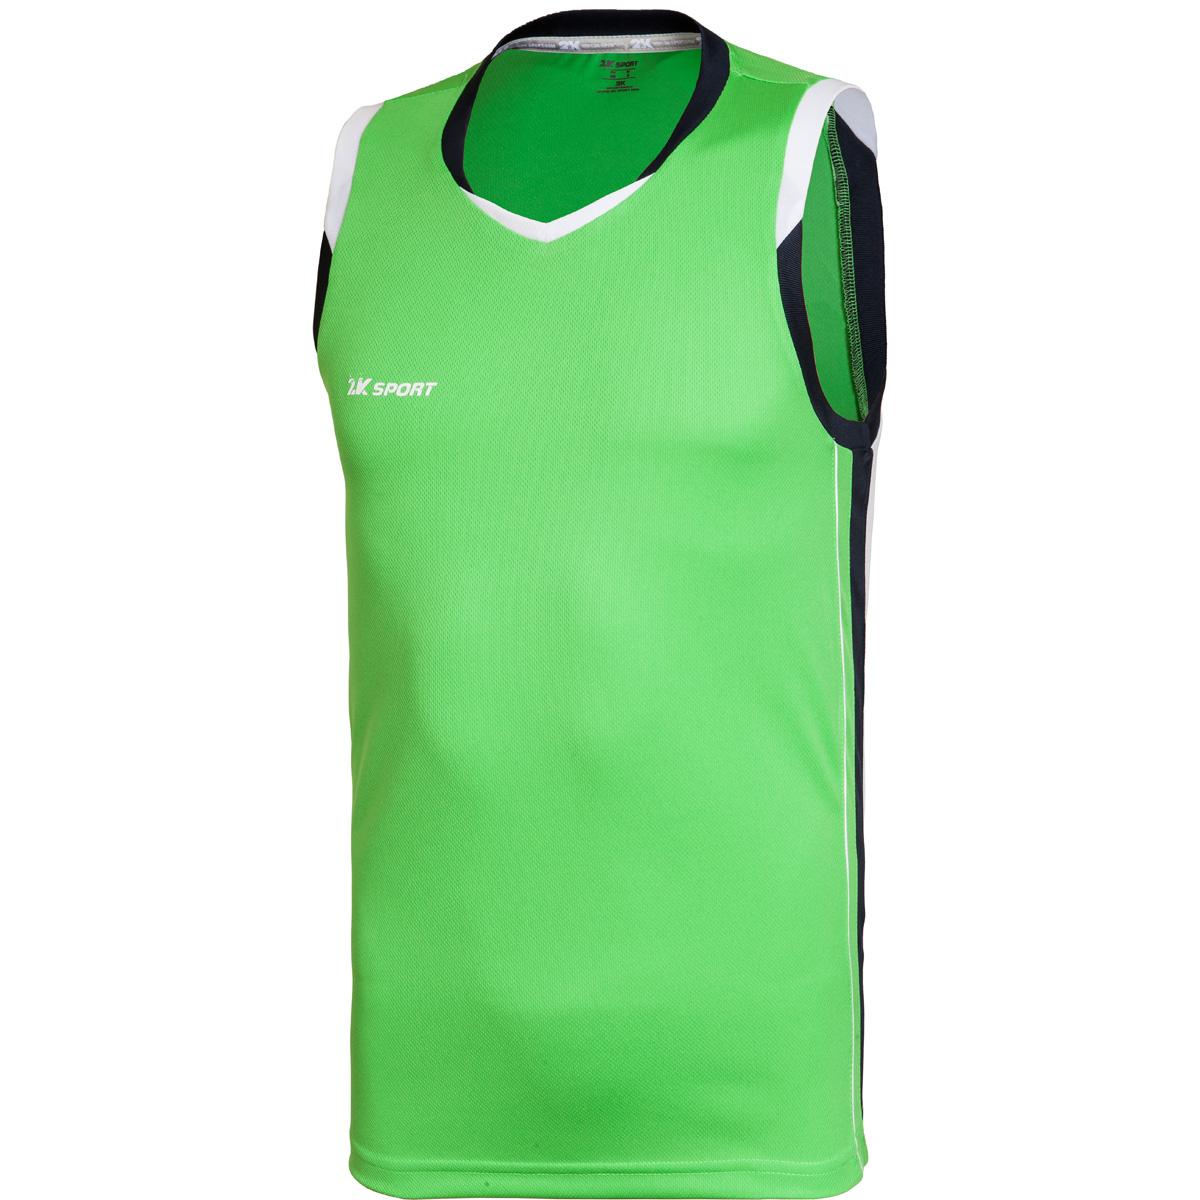 Майка баскетбольная мужская 2K Sport Advance, цвет: светло-зеленый, темно-синий, белый. 130030. Размер XS (44) - Баскетбол